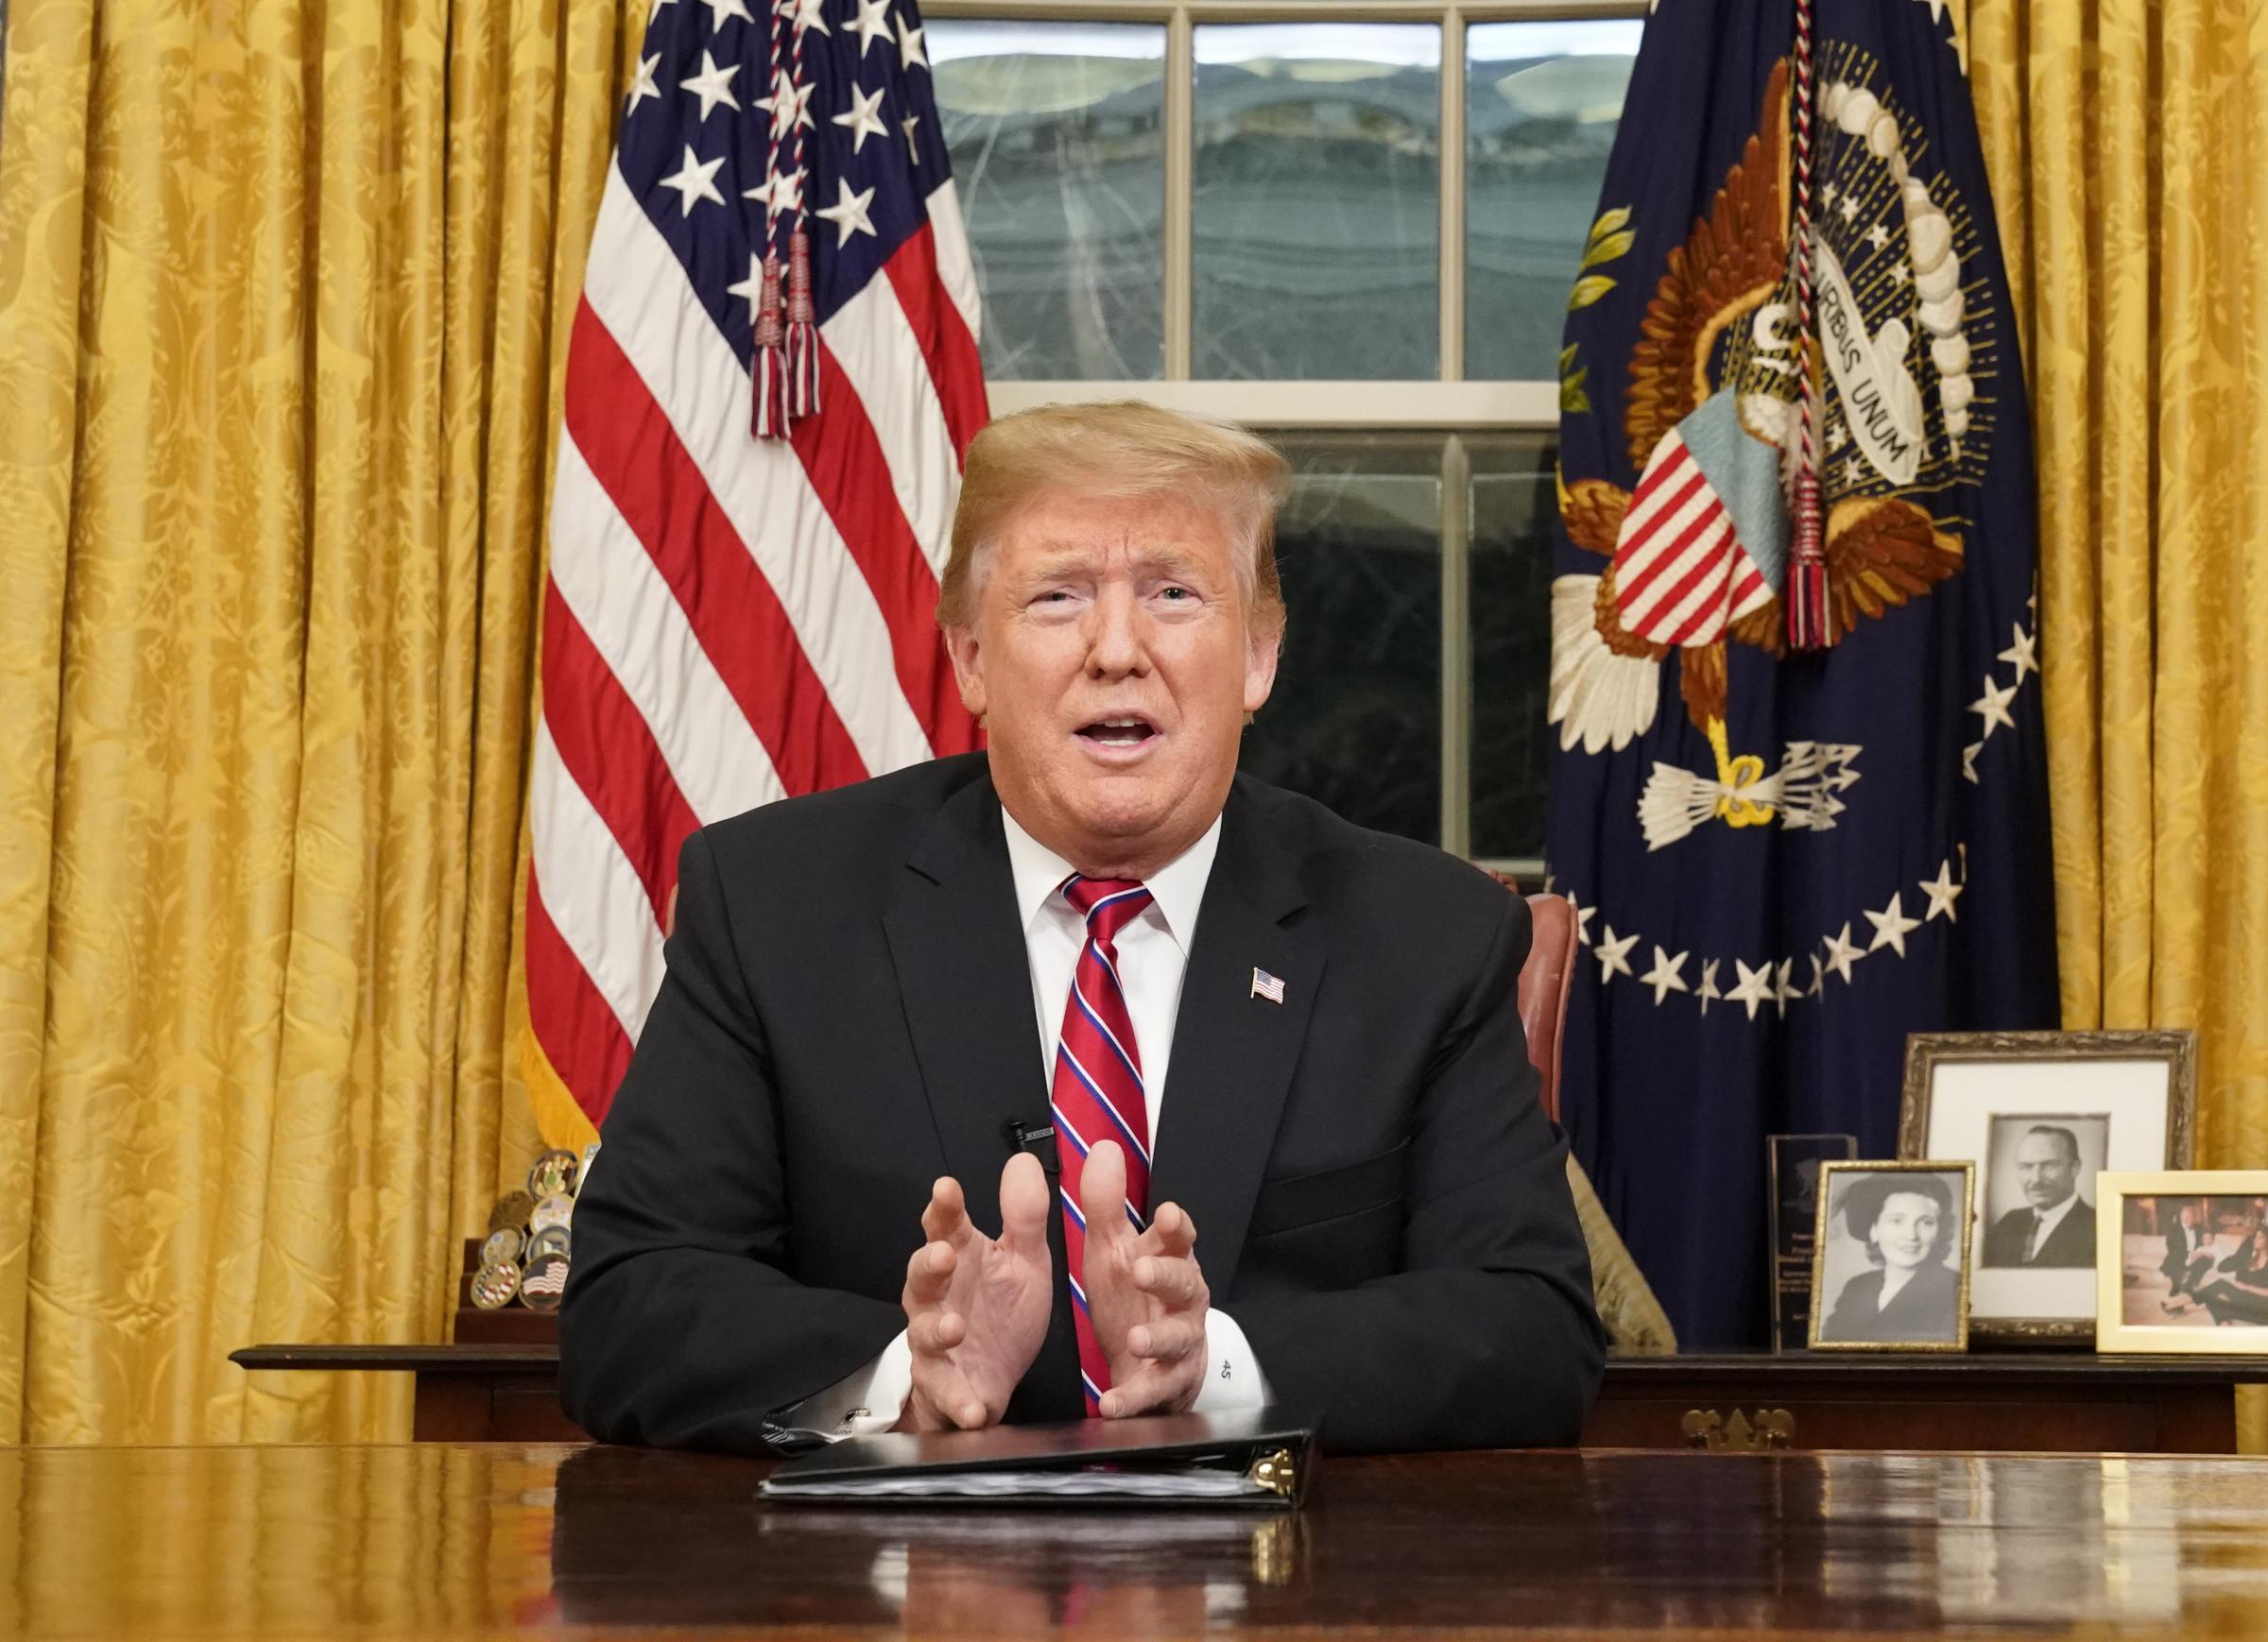 Trump in office